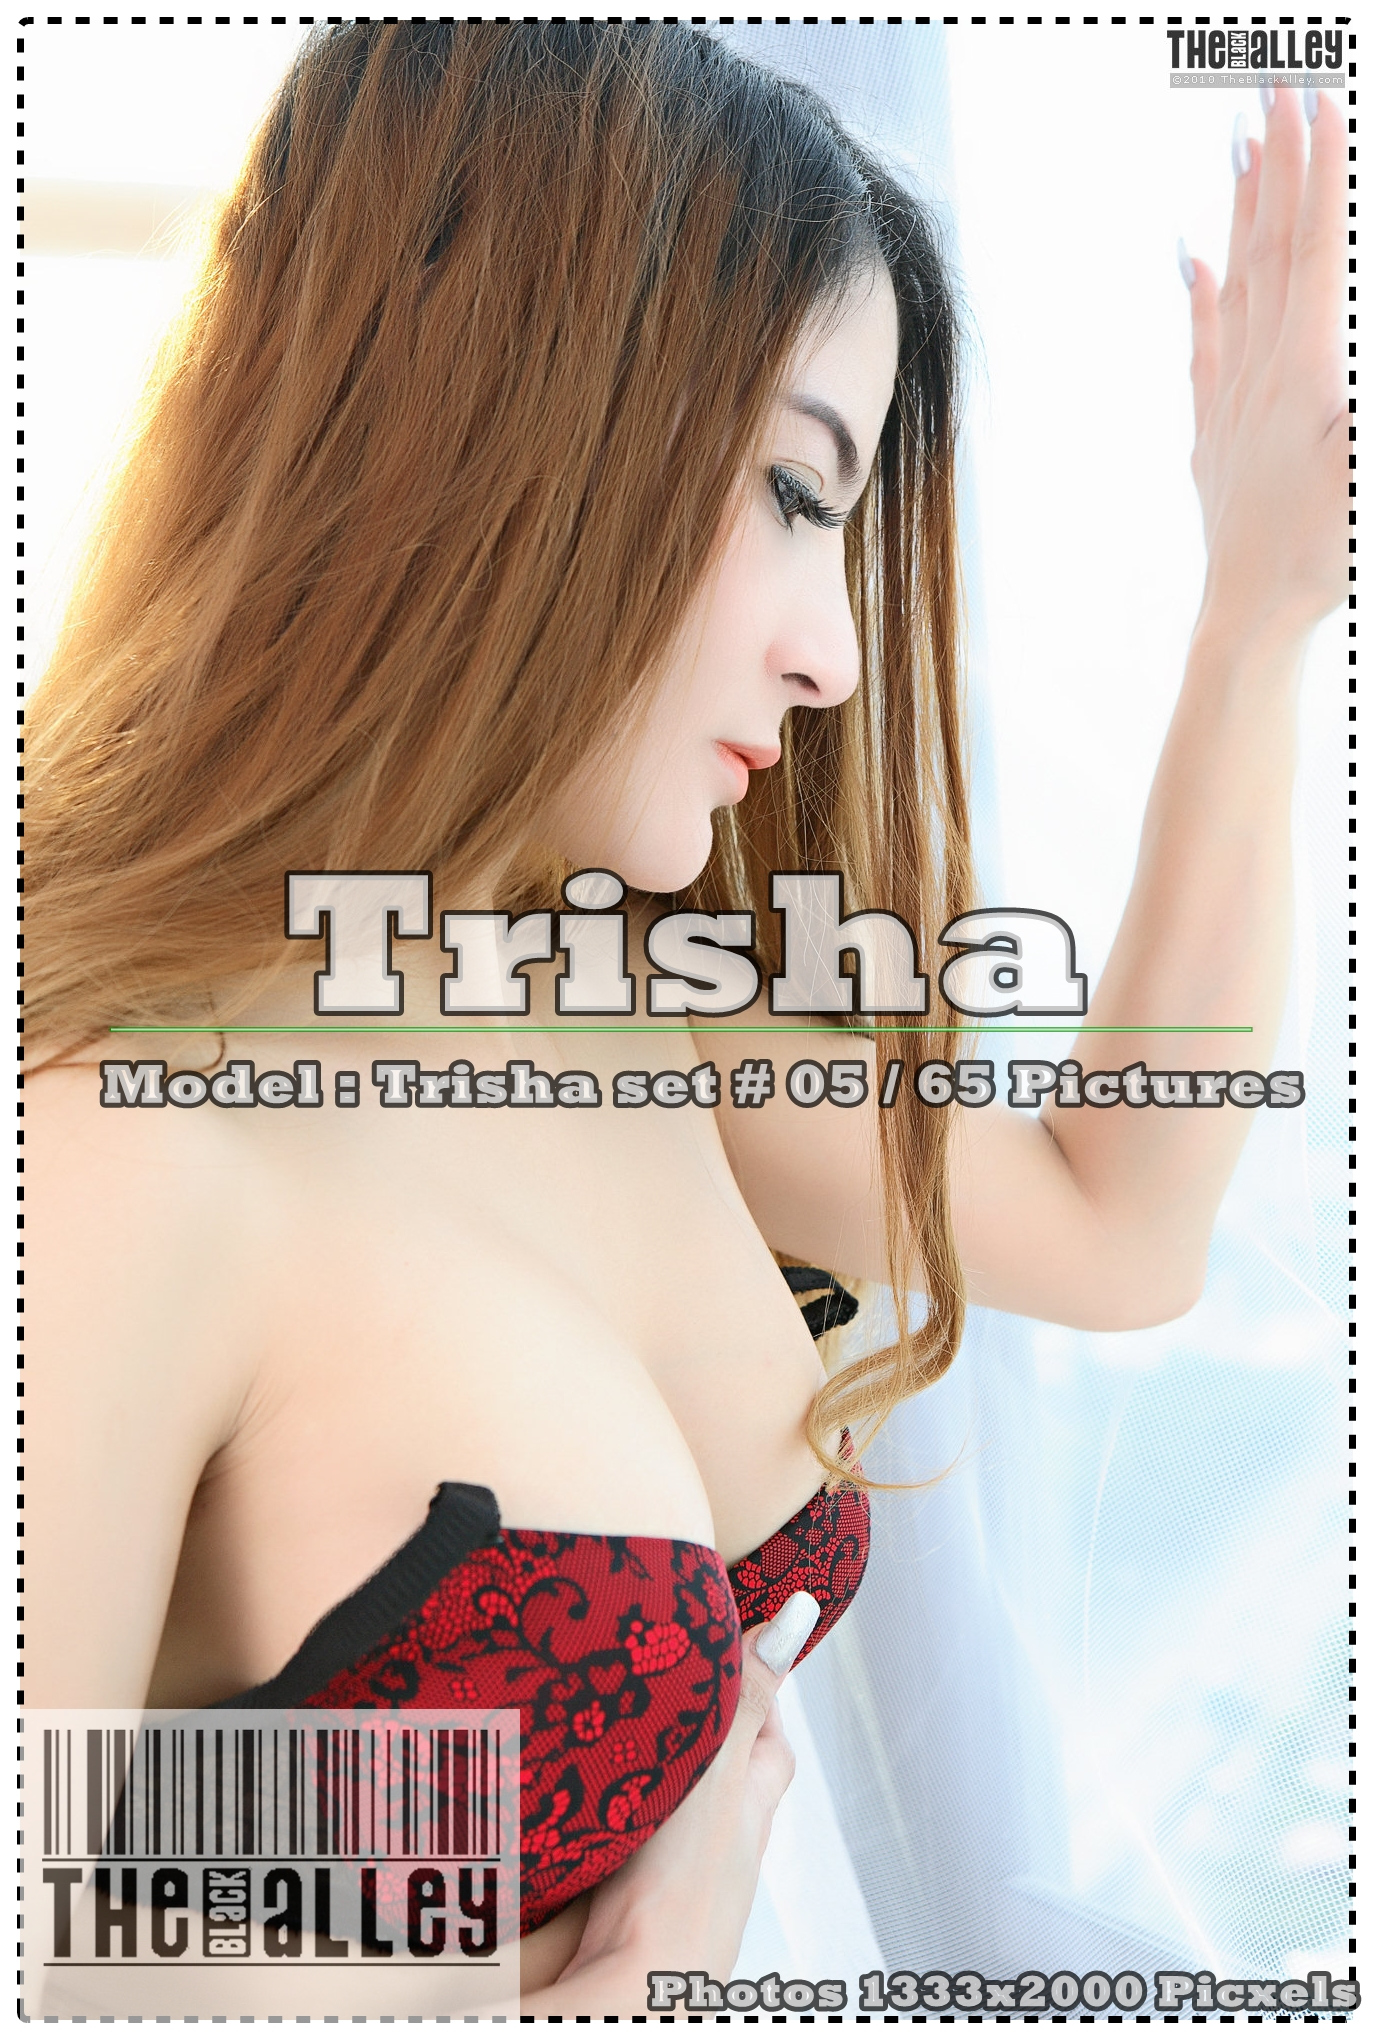 litu 100 archives: [TheBlackAlley] Trisha Set 05